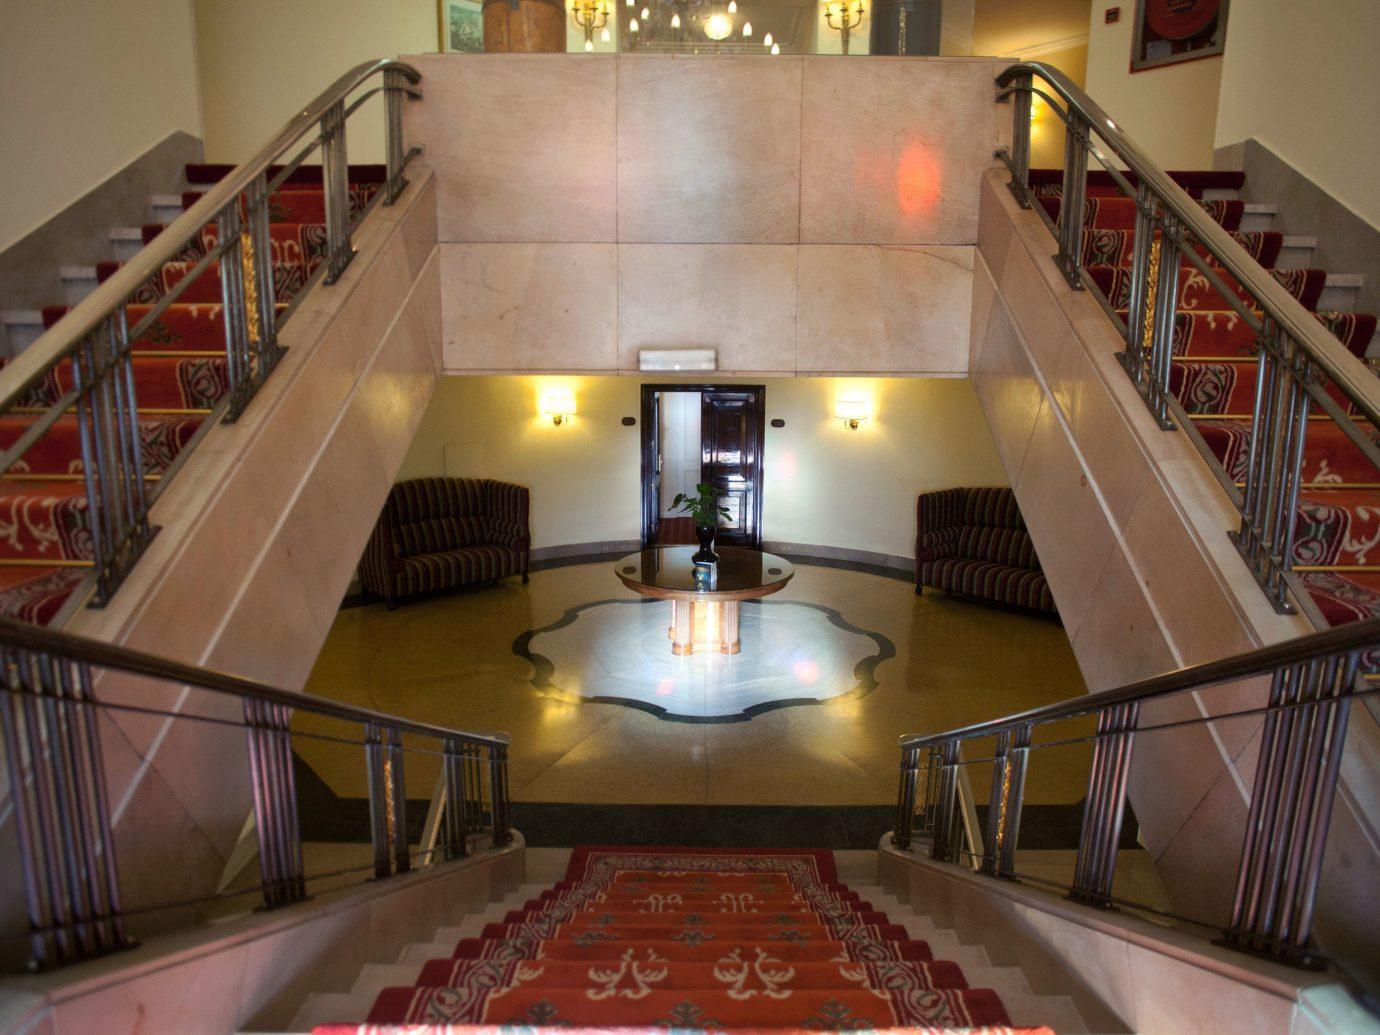 Hotels Madrid Spain indoor wall floor auditorium Kitchen building interior design tourist attraction theatre area